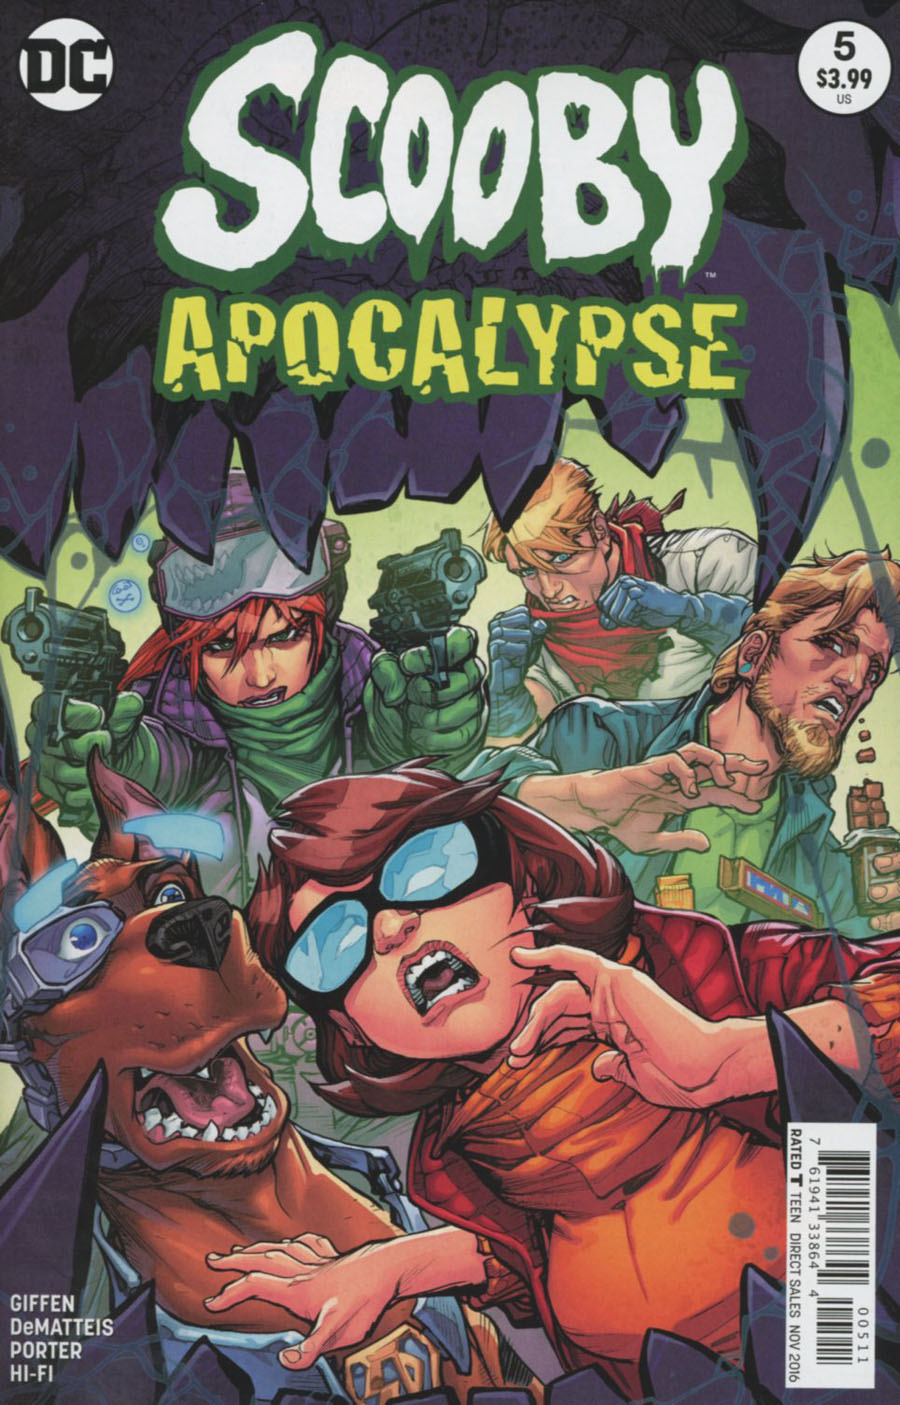 Scooby Apocalypse #5 Cover A Regular Howard Porter Cover